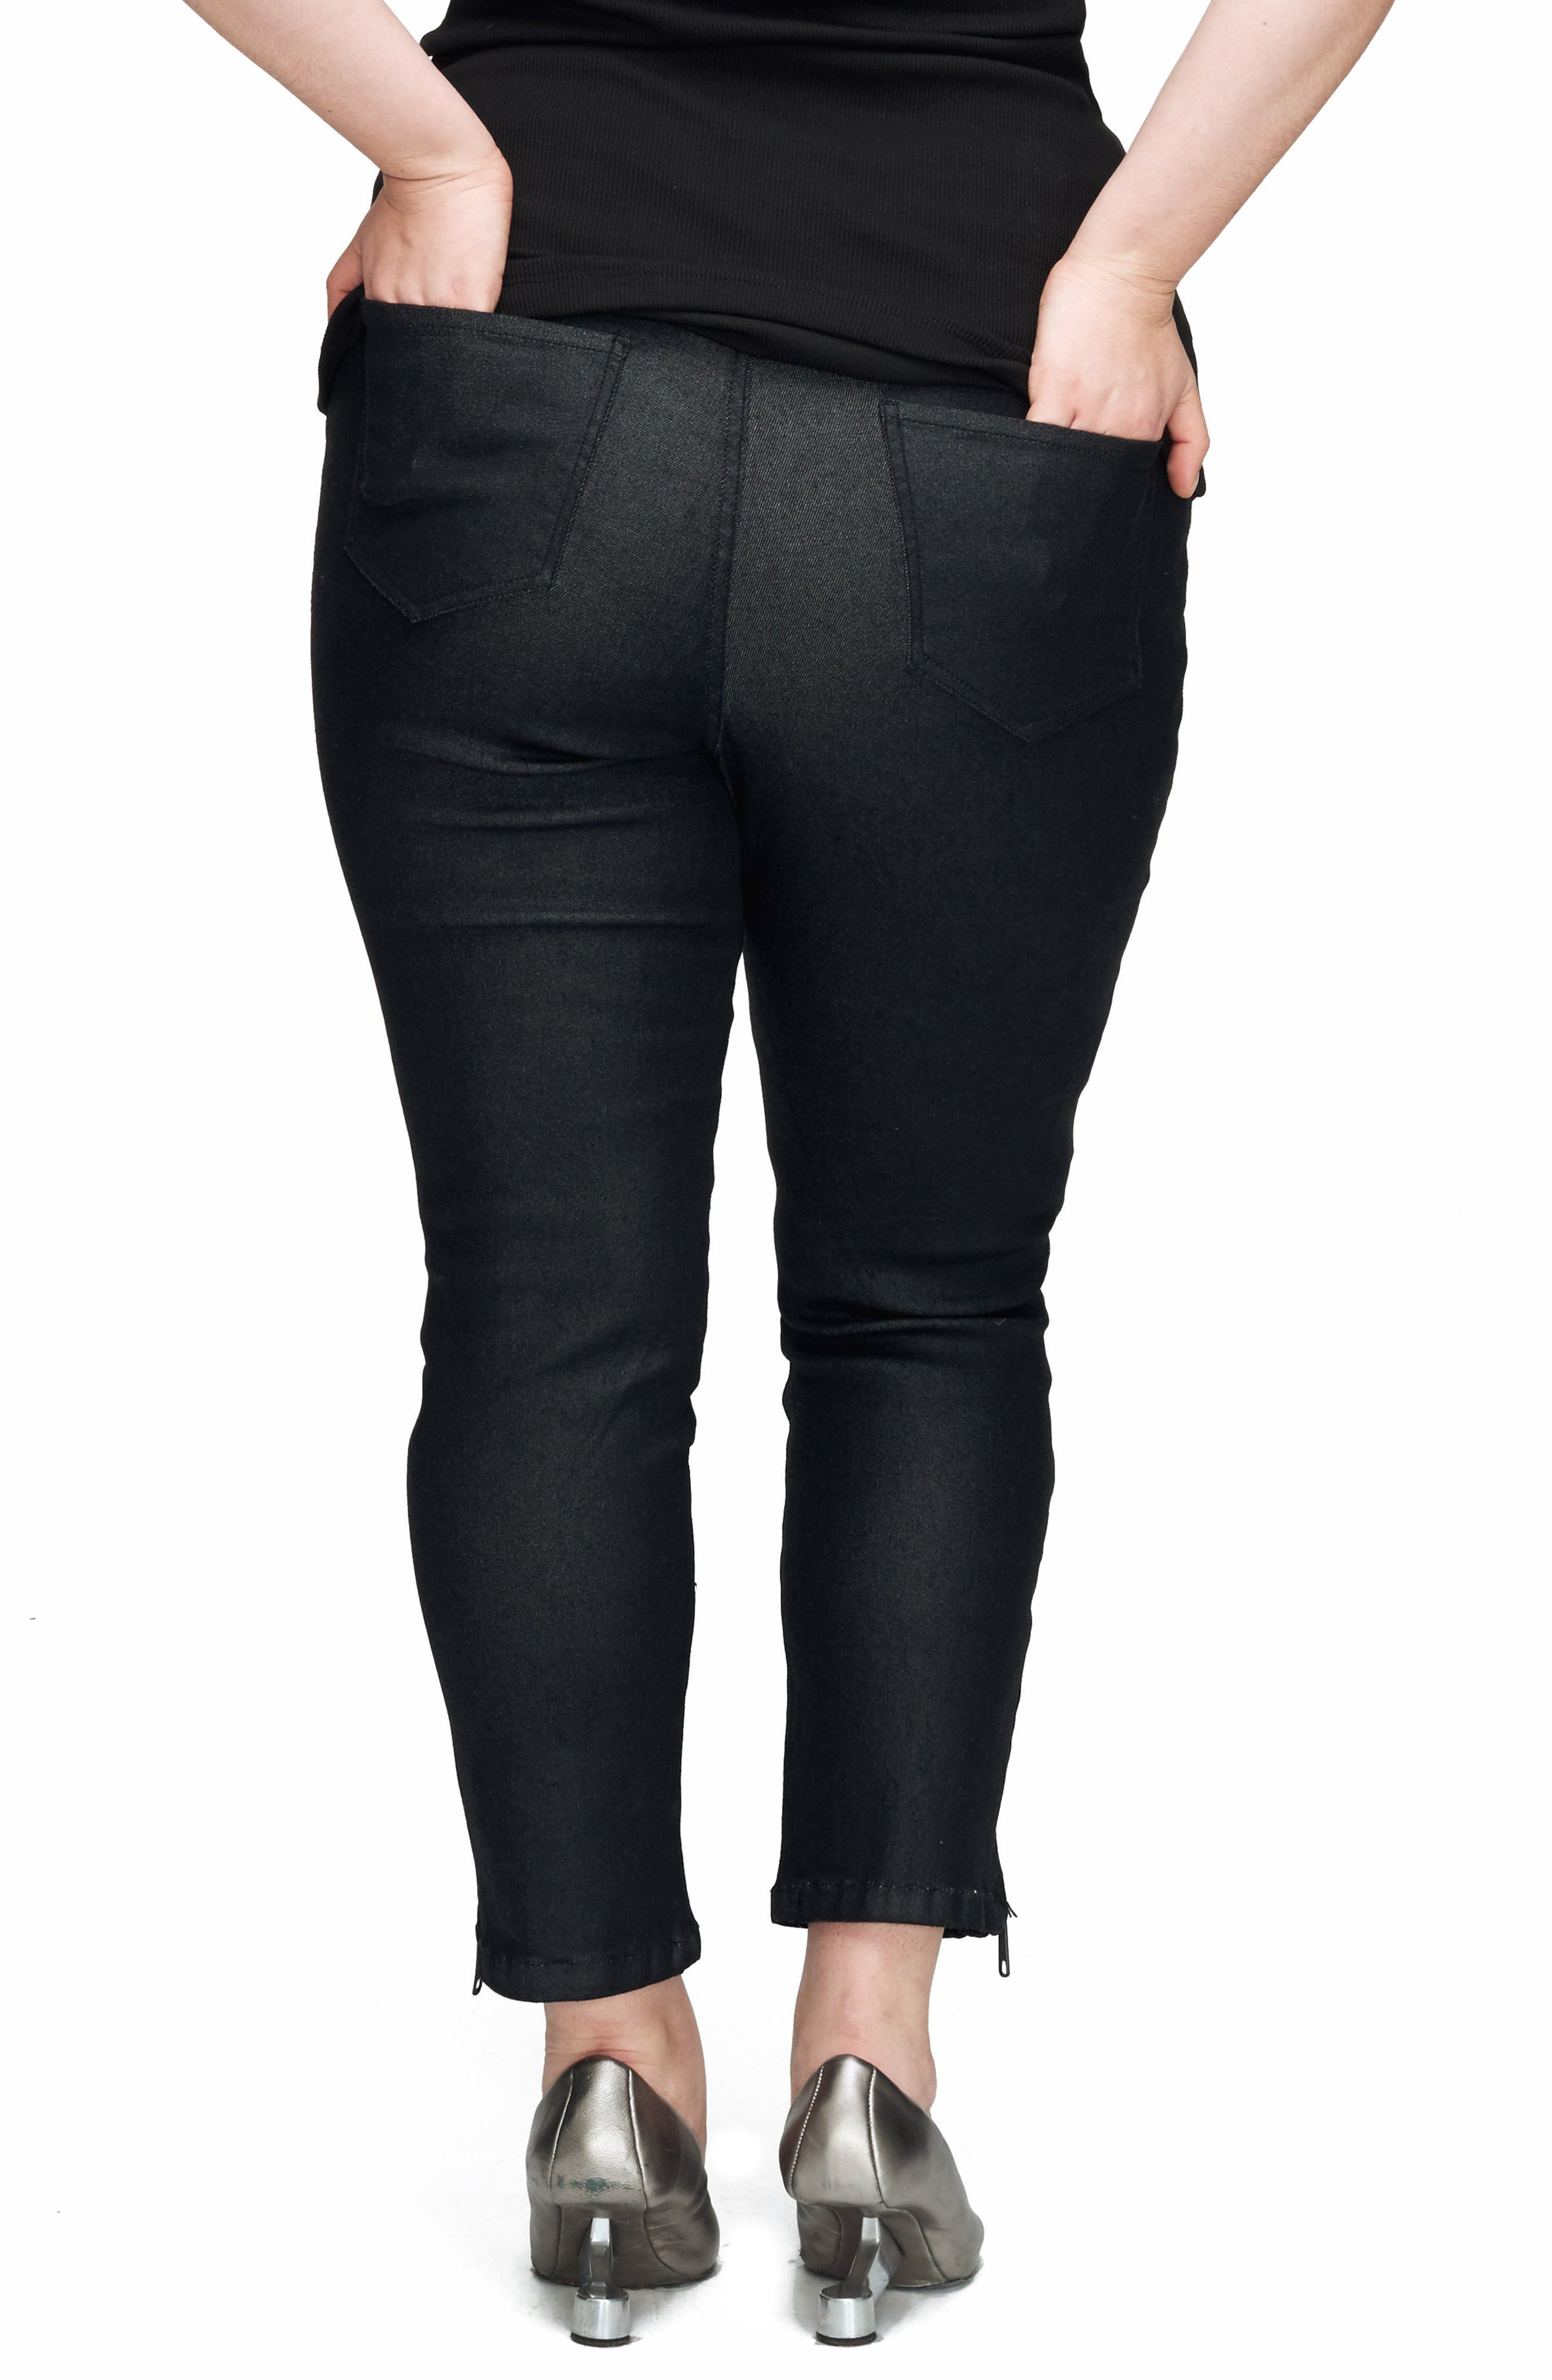 Meuse Resin Tapered Ankle Jeans,                             Alternate thumbnail 2, color,                             BLACK